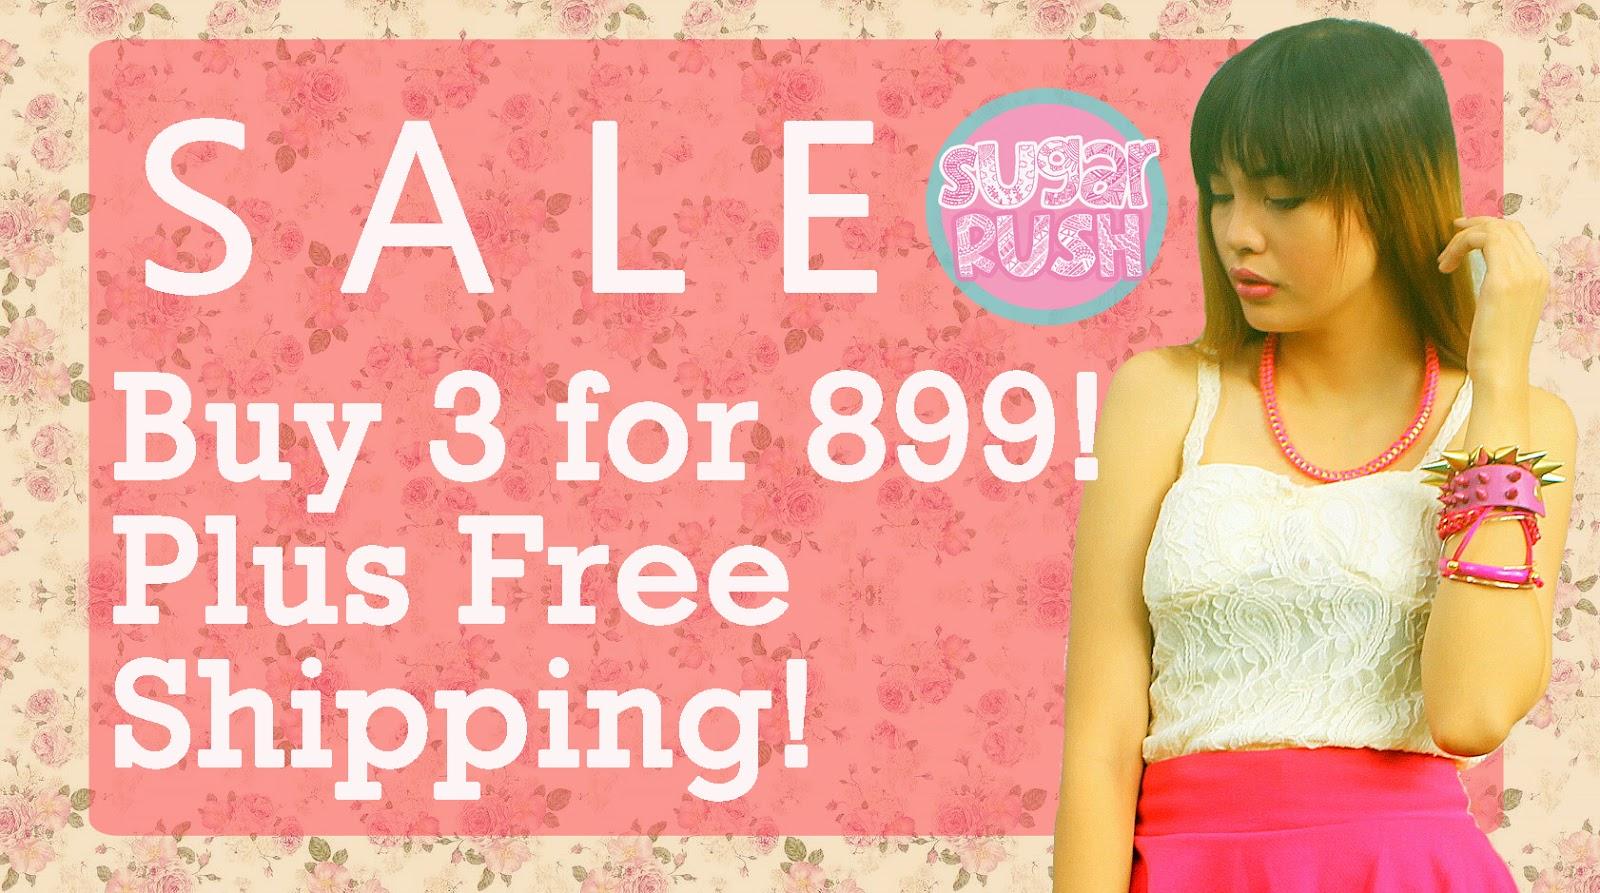 Sugar-Rush Sale Clothing Philippines